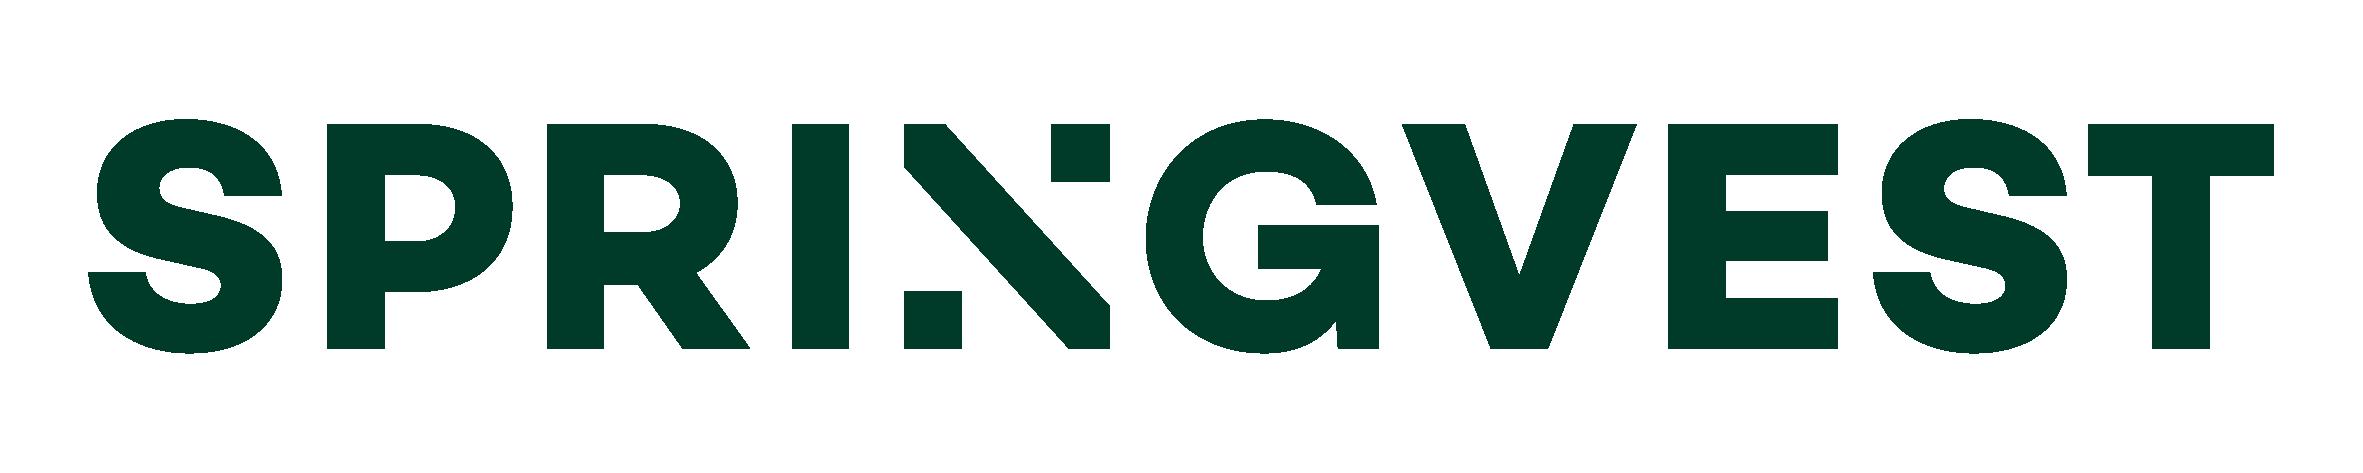 Springvest logotype green rgb